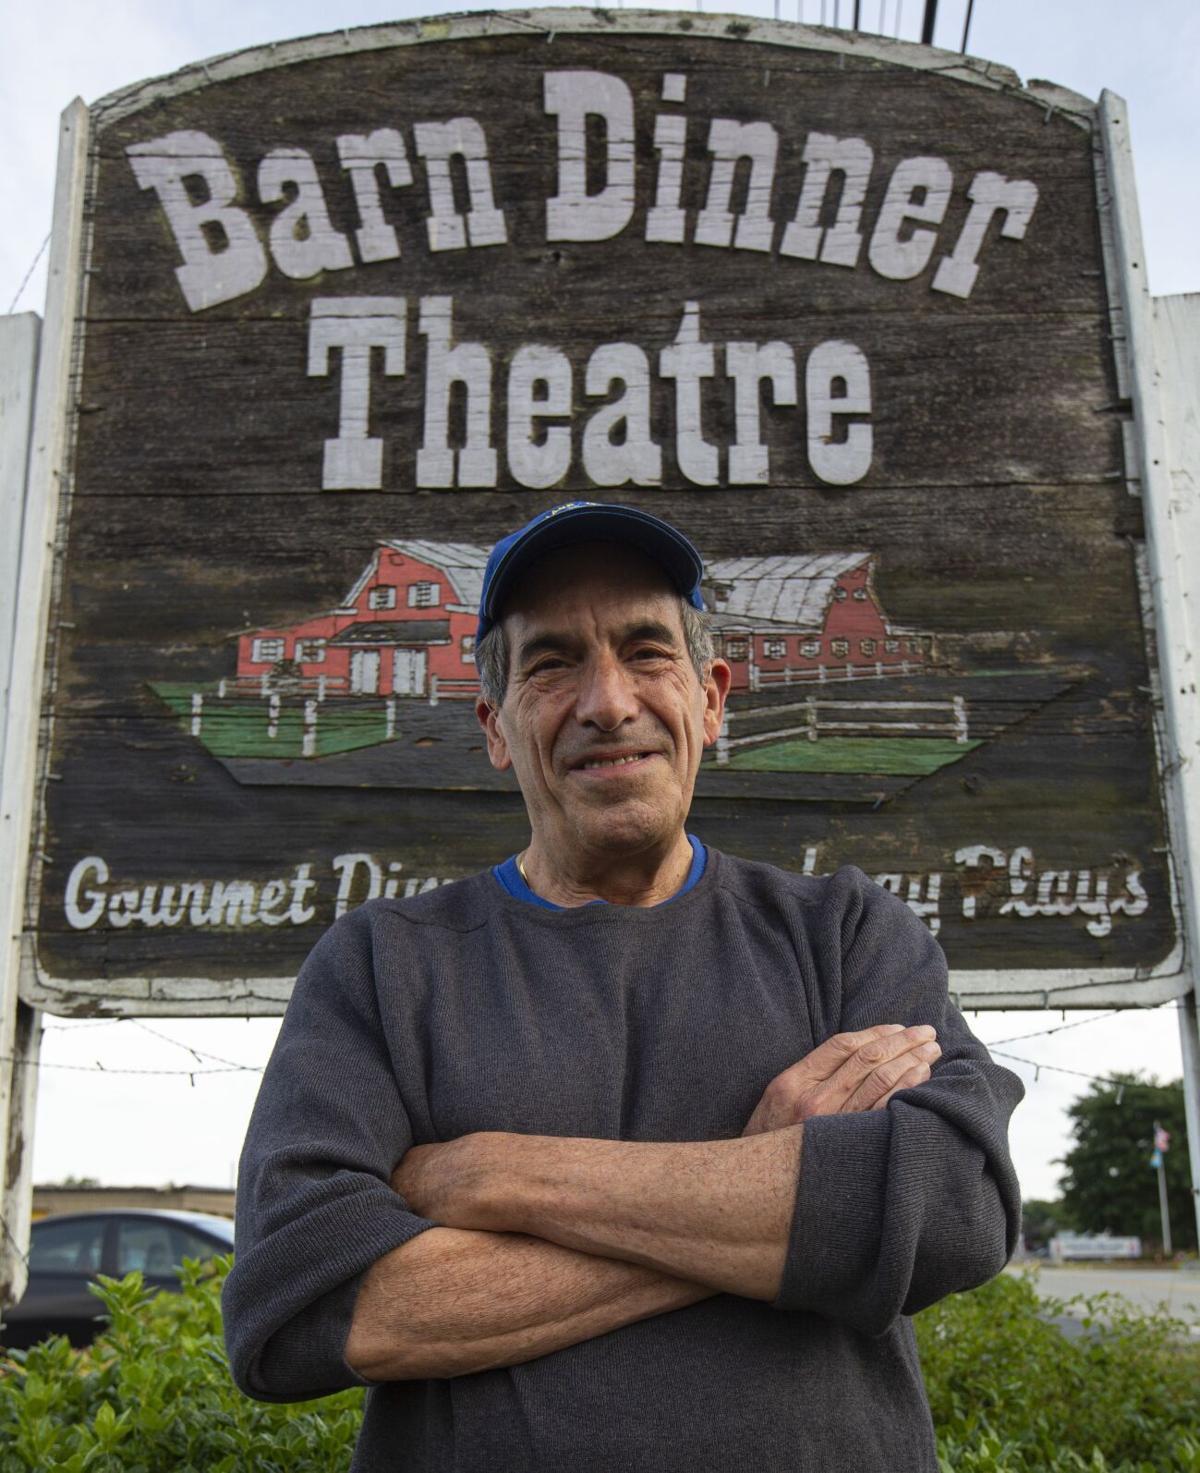 Barn Dinner Theatre